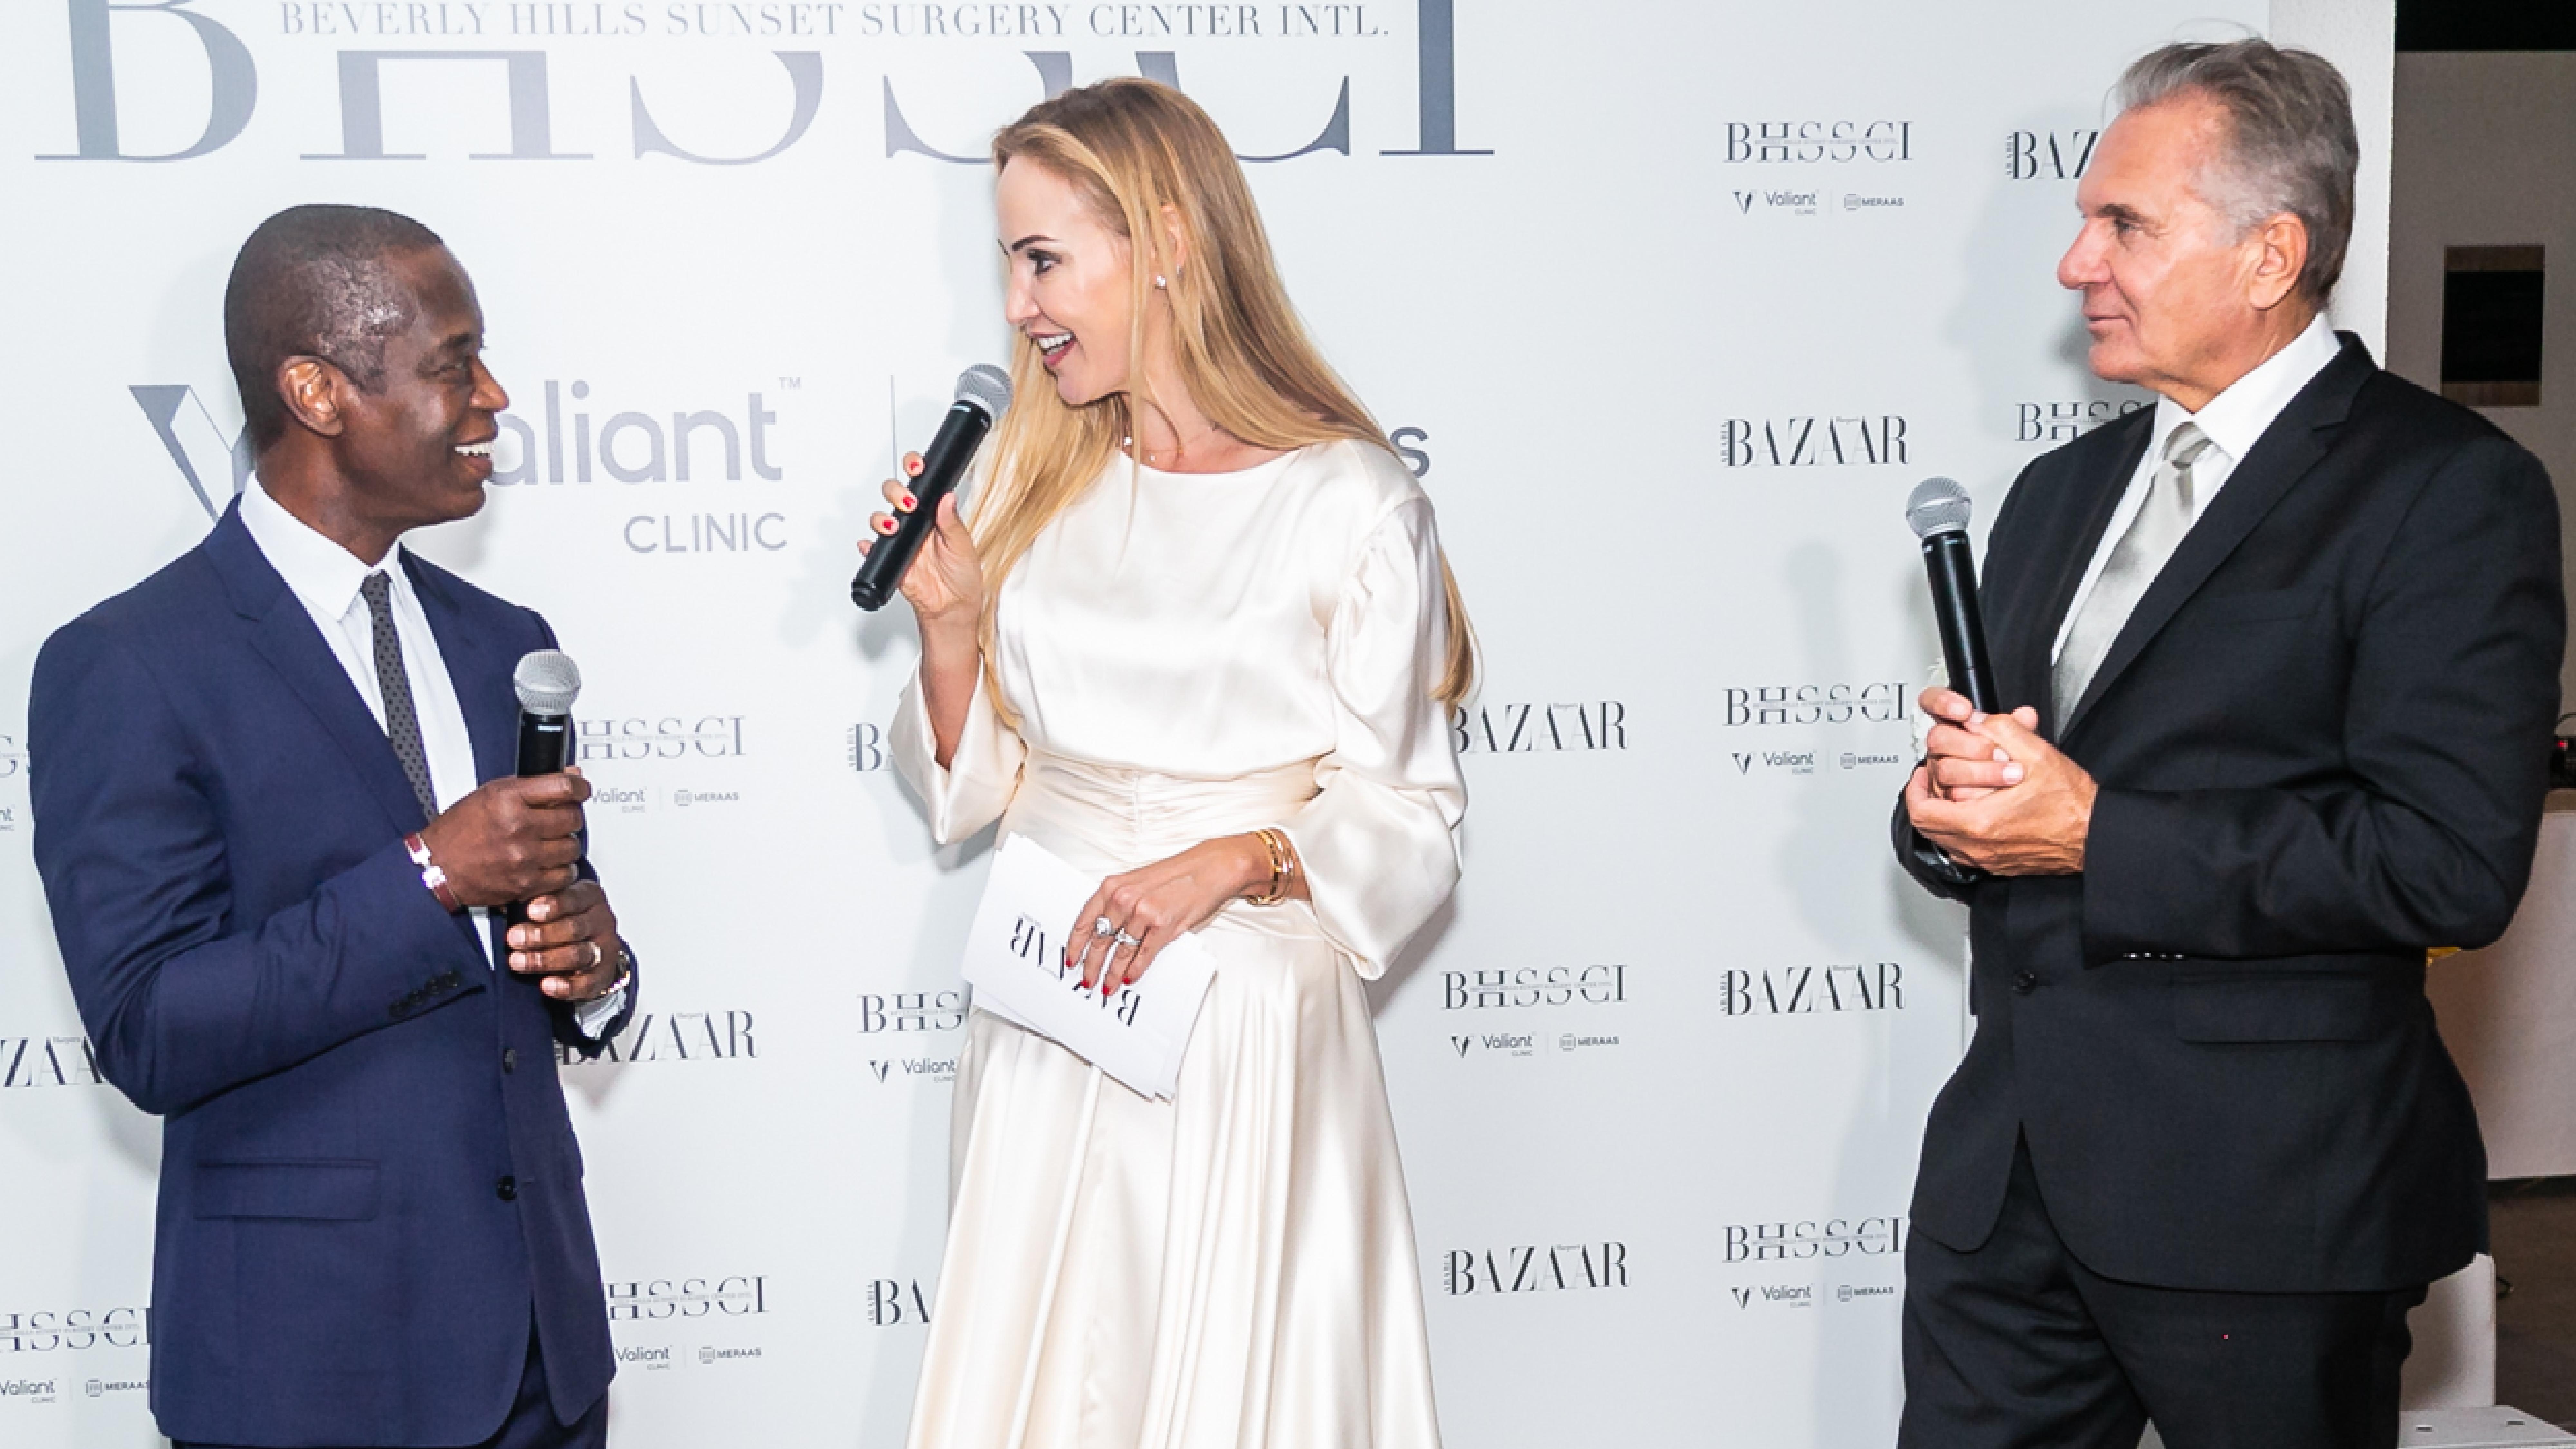 BAZAAR X BHSSCI: A Beauty Talk With Hollywood's Go-To Surgeons